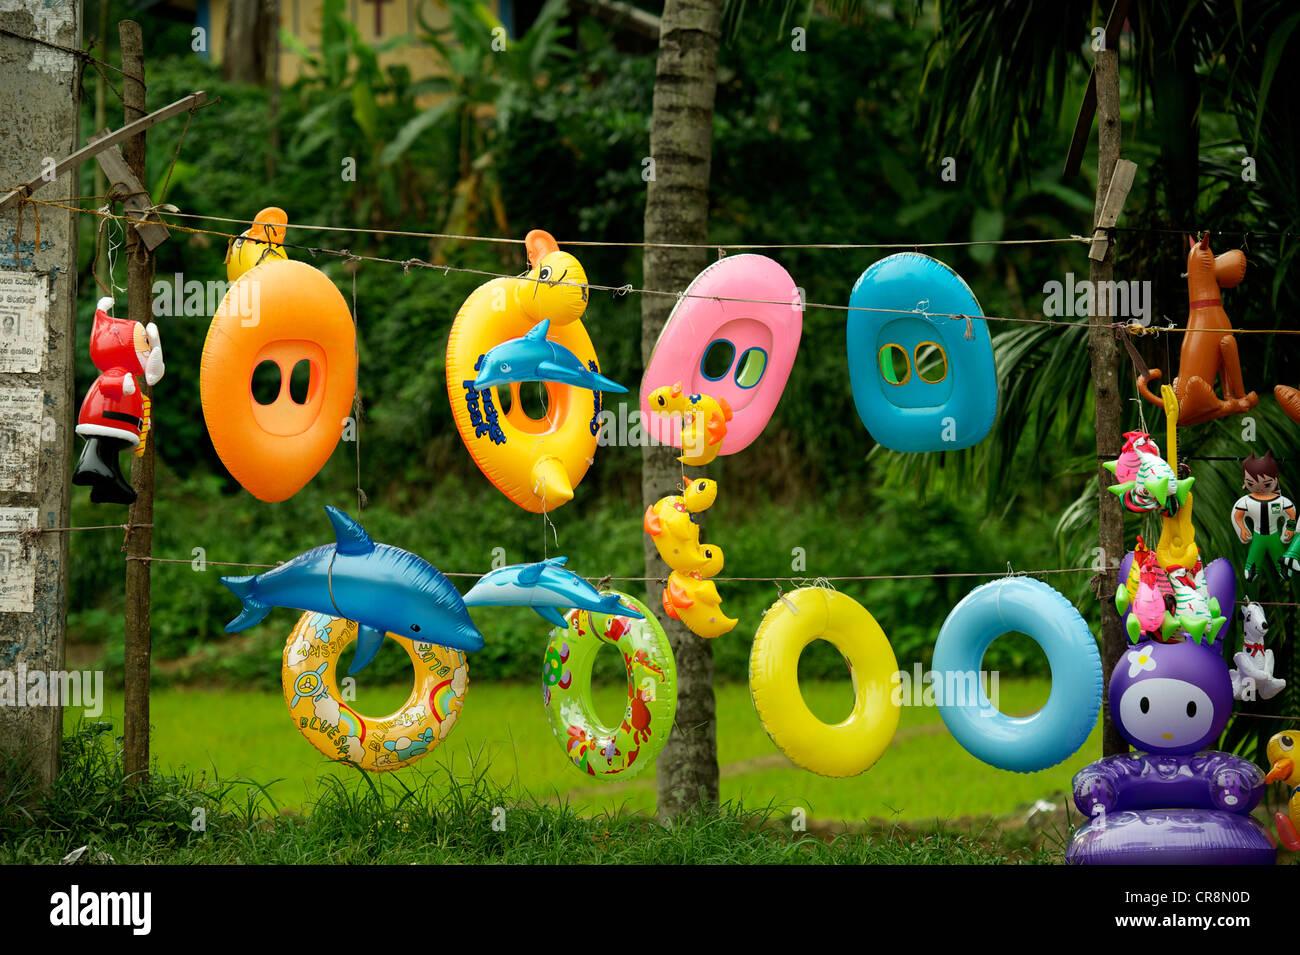 Inflatable toys, Sri Lanka Stock Photo